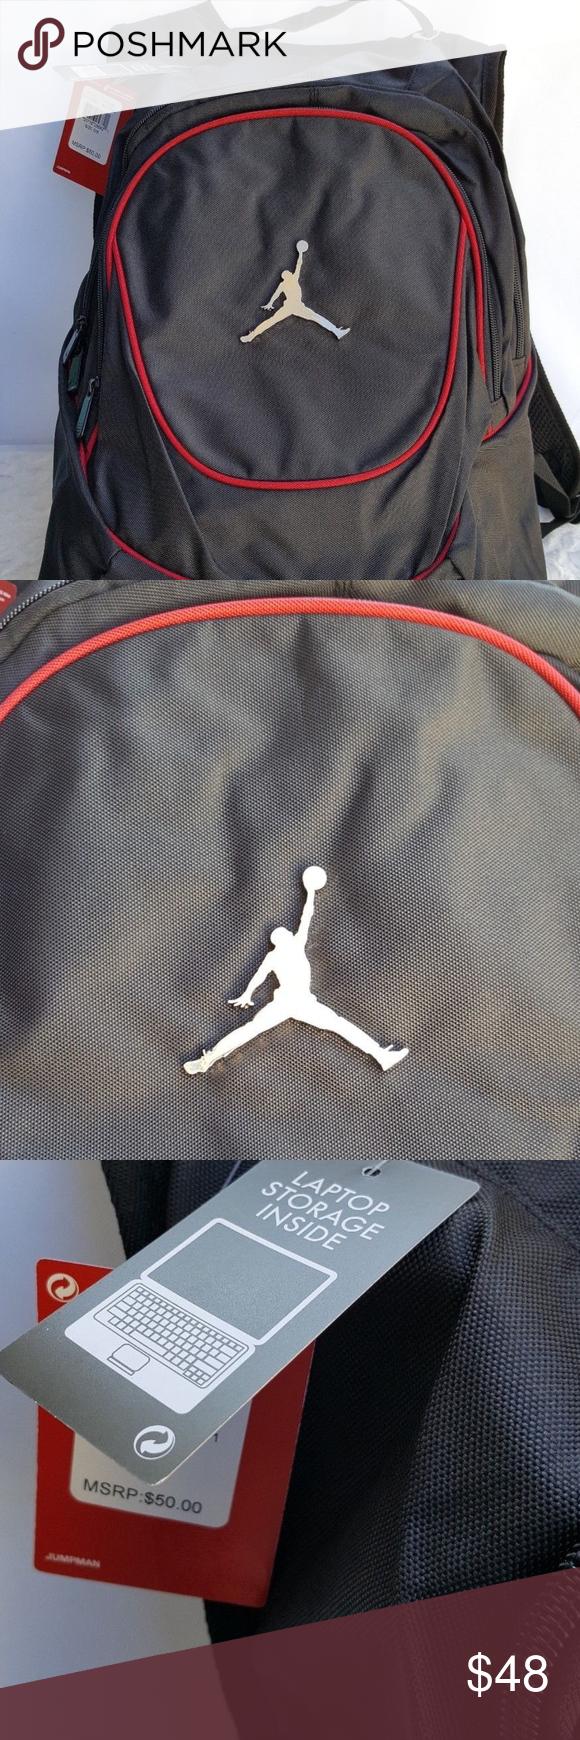 f506570cf1a1 NWT Nike Air Jordan Jumpman Backpack Book Bag New Nike Air Jordan Jumpman Laptop  Storage Inside